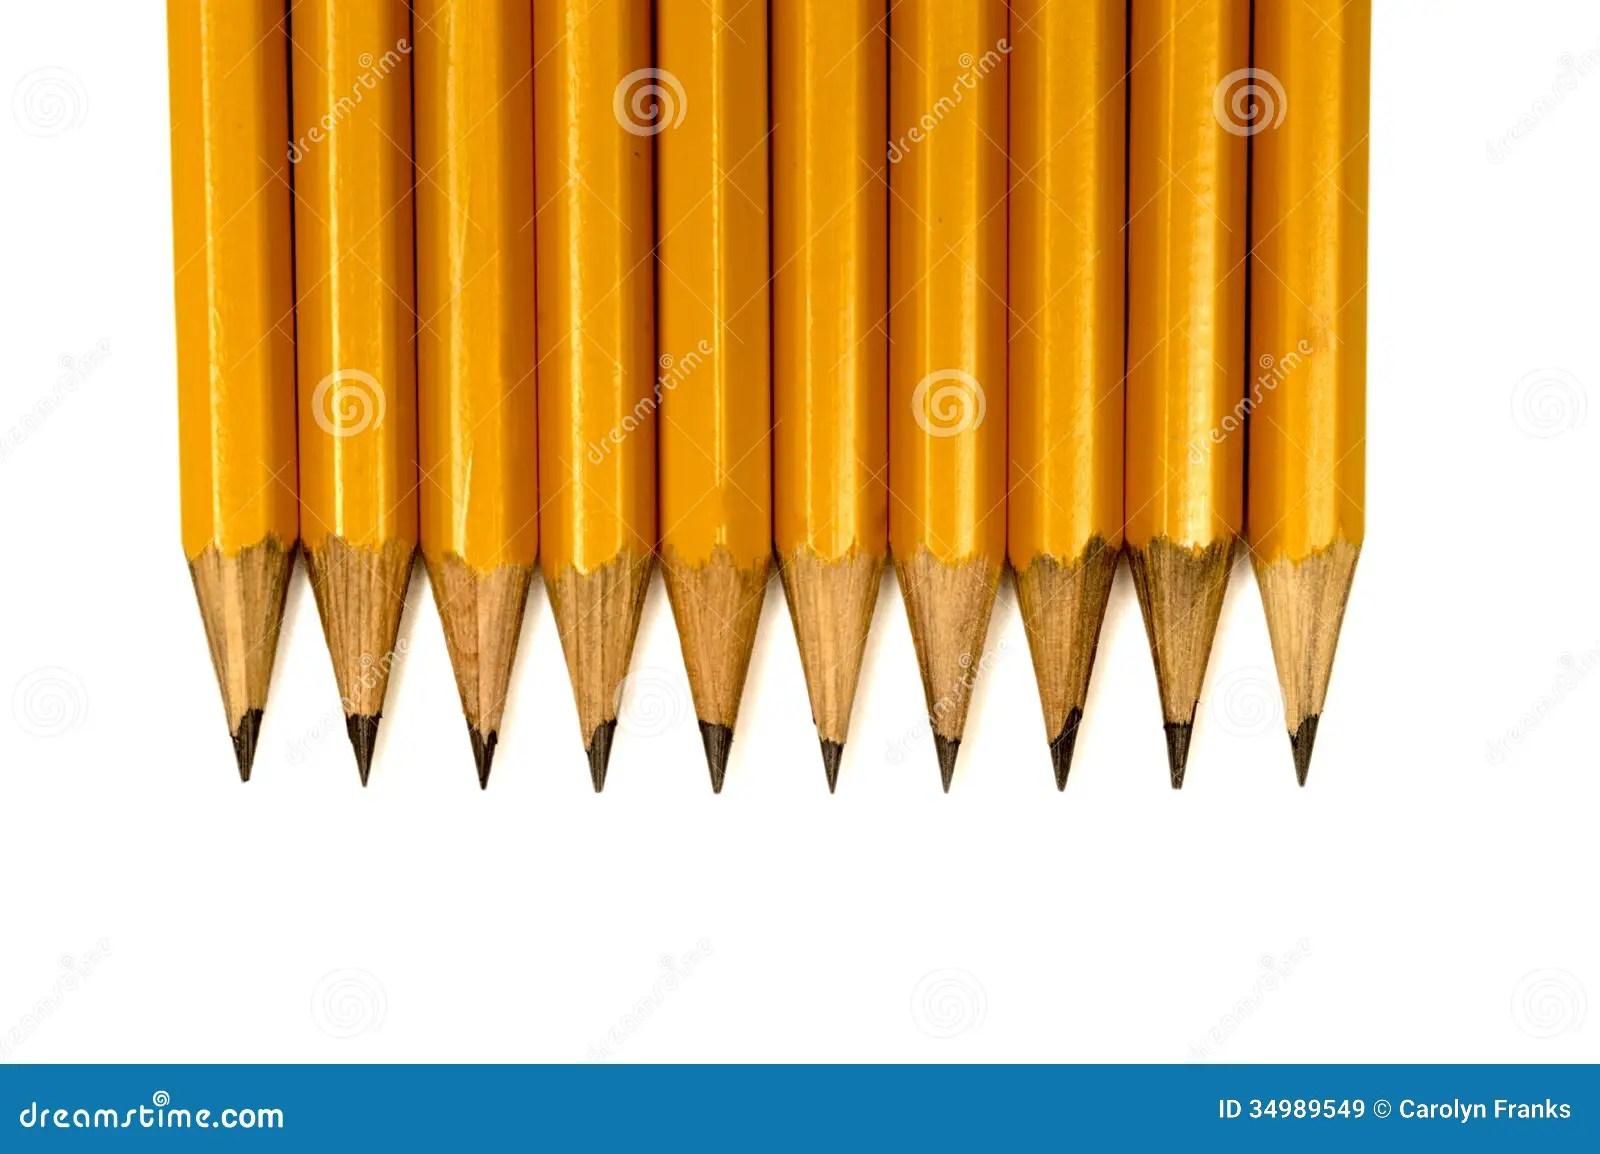 Close Up Shot Of Sharpened Pencils Stock Image